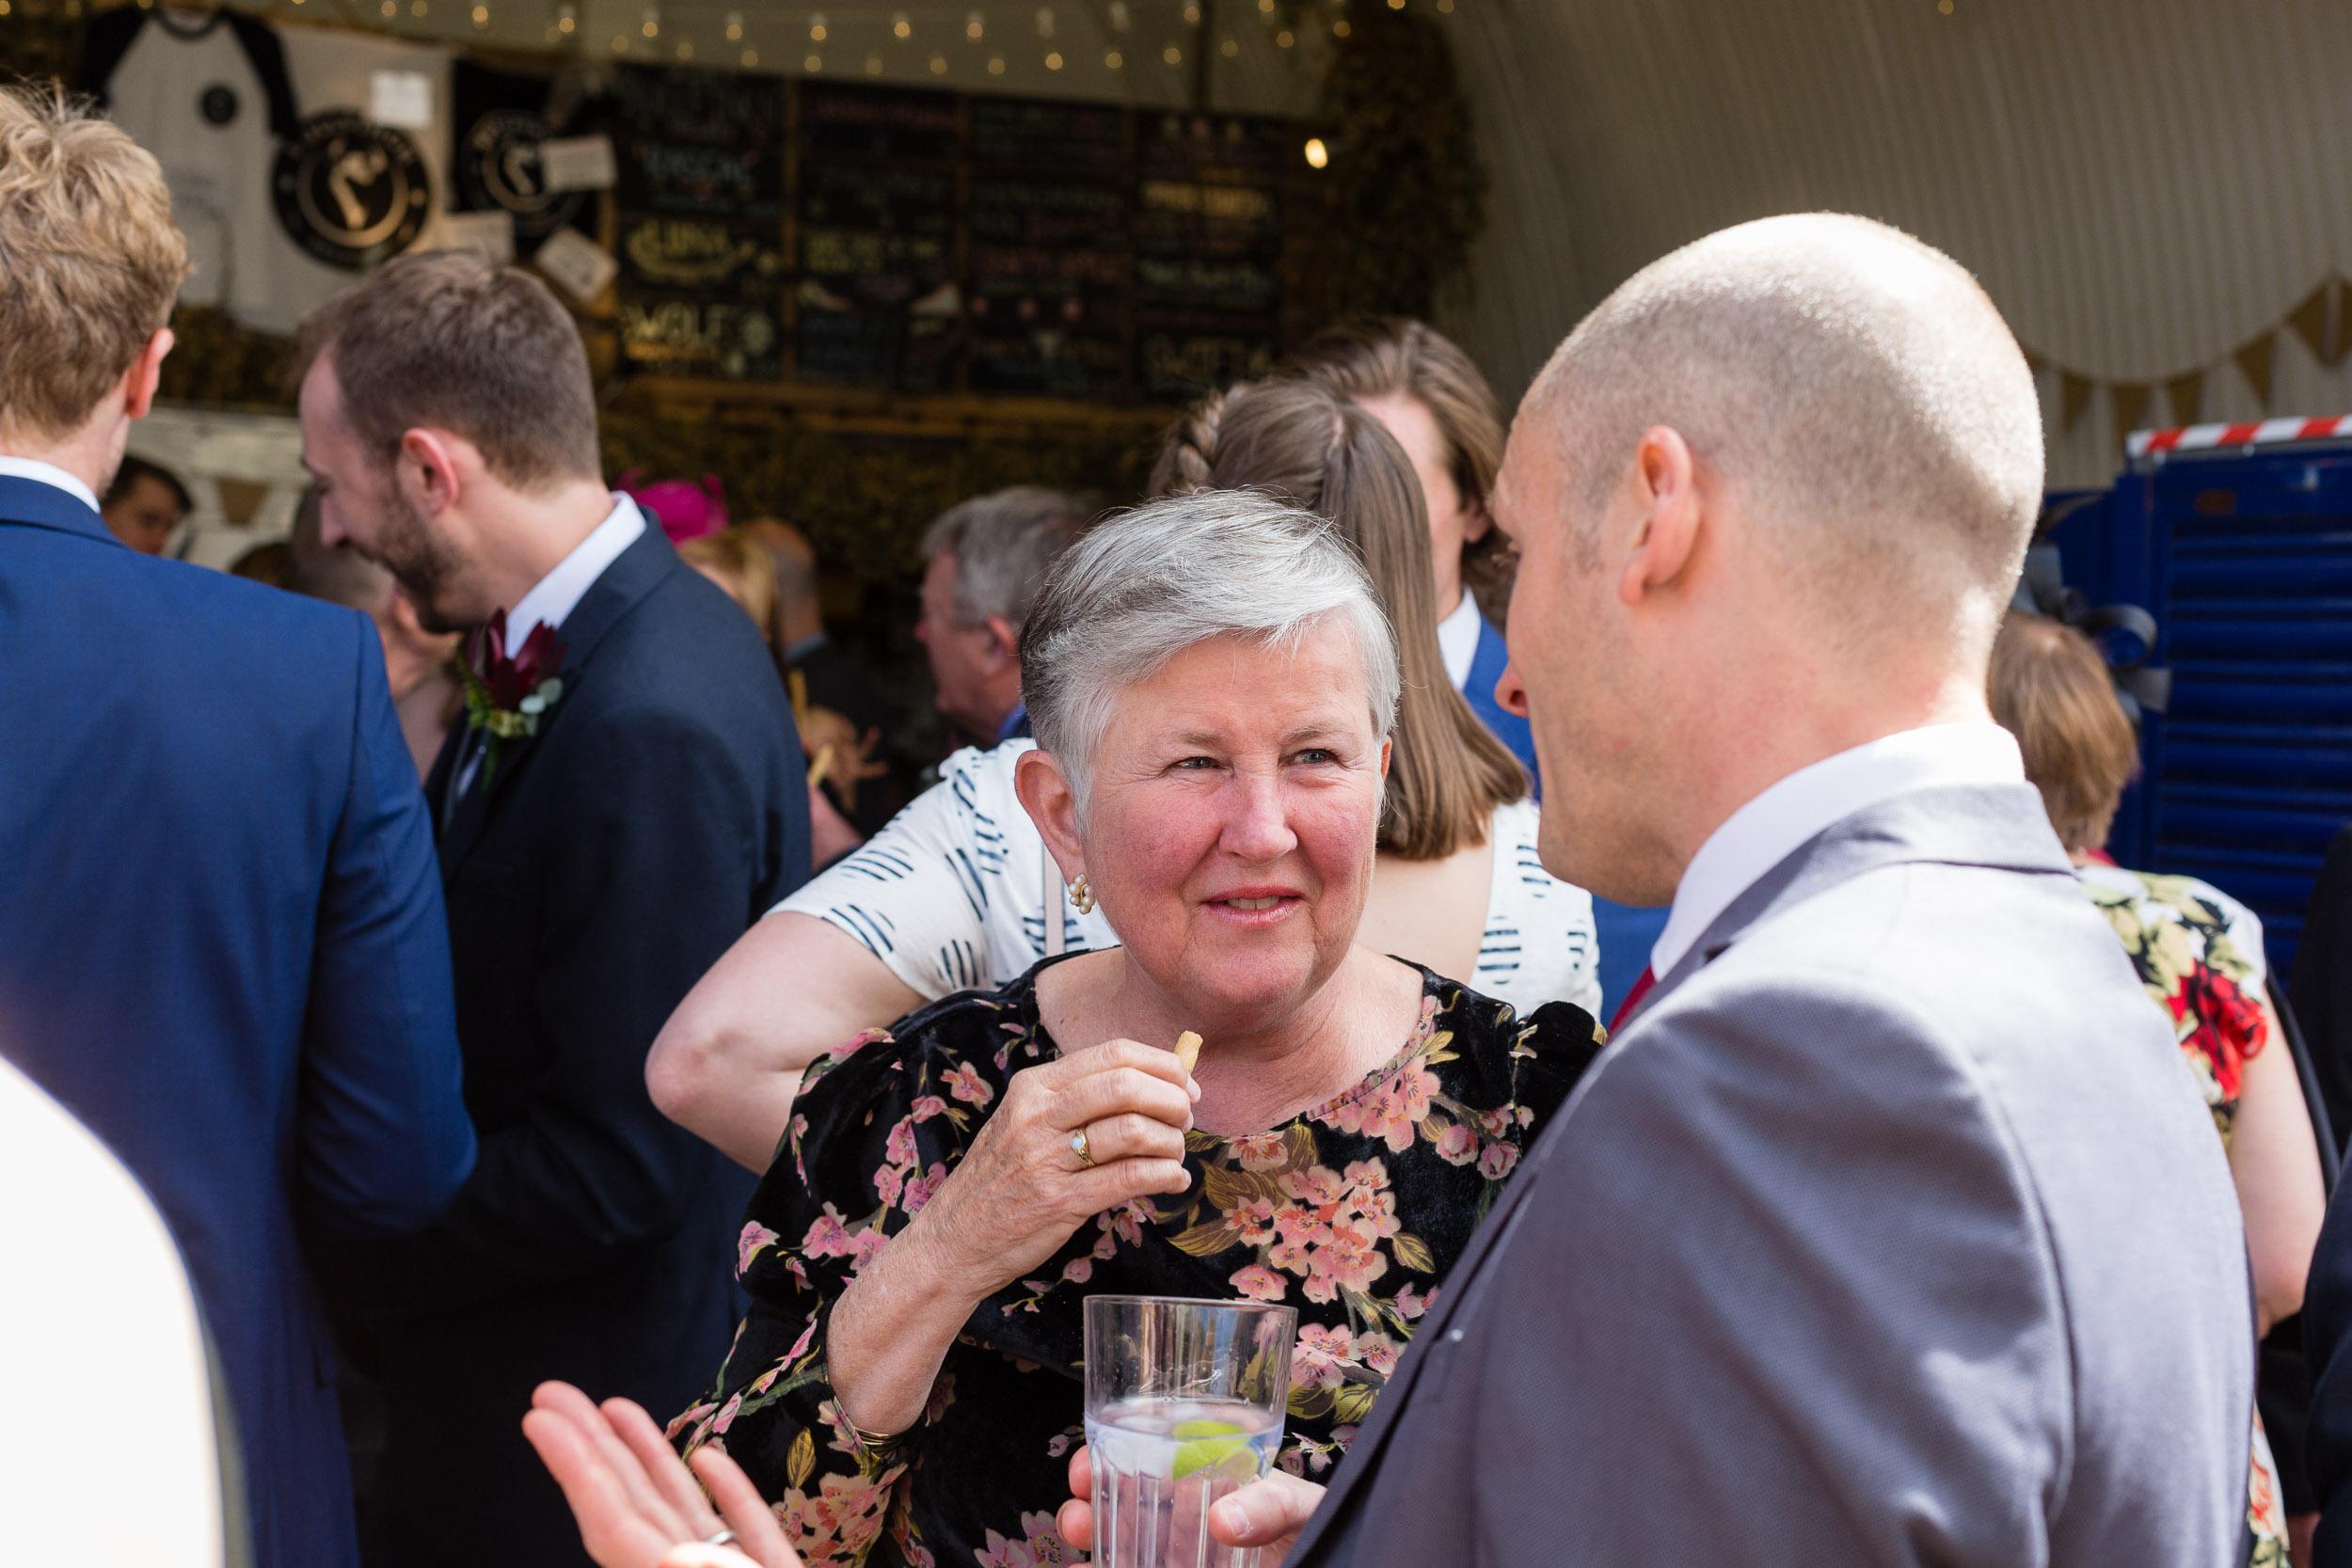 brockwell-lido-brixton-herne-hill-wedding-072.jpg